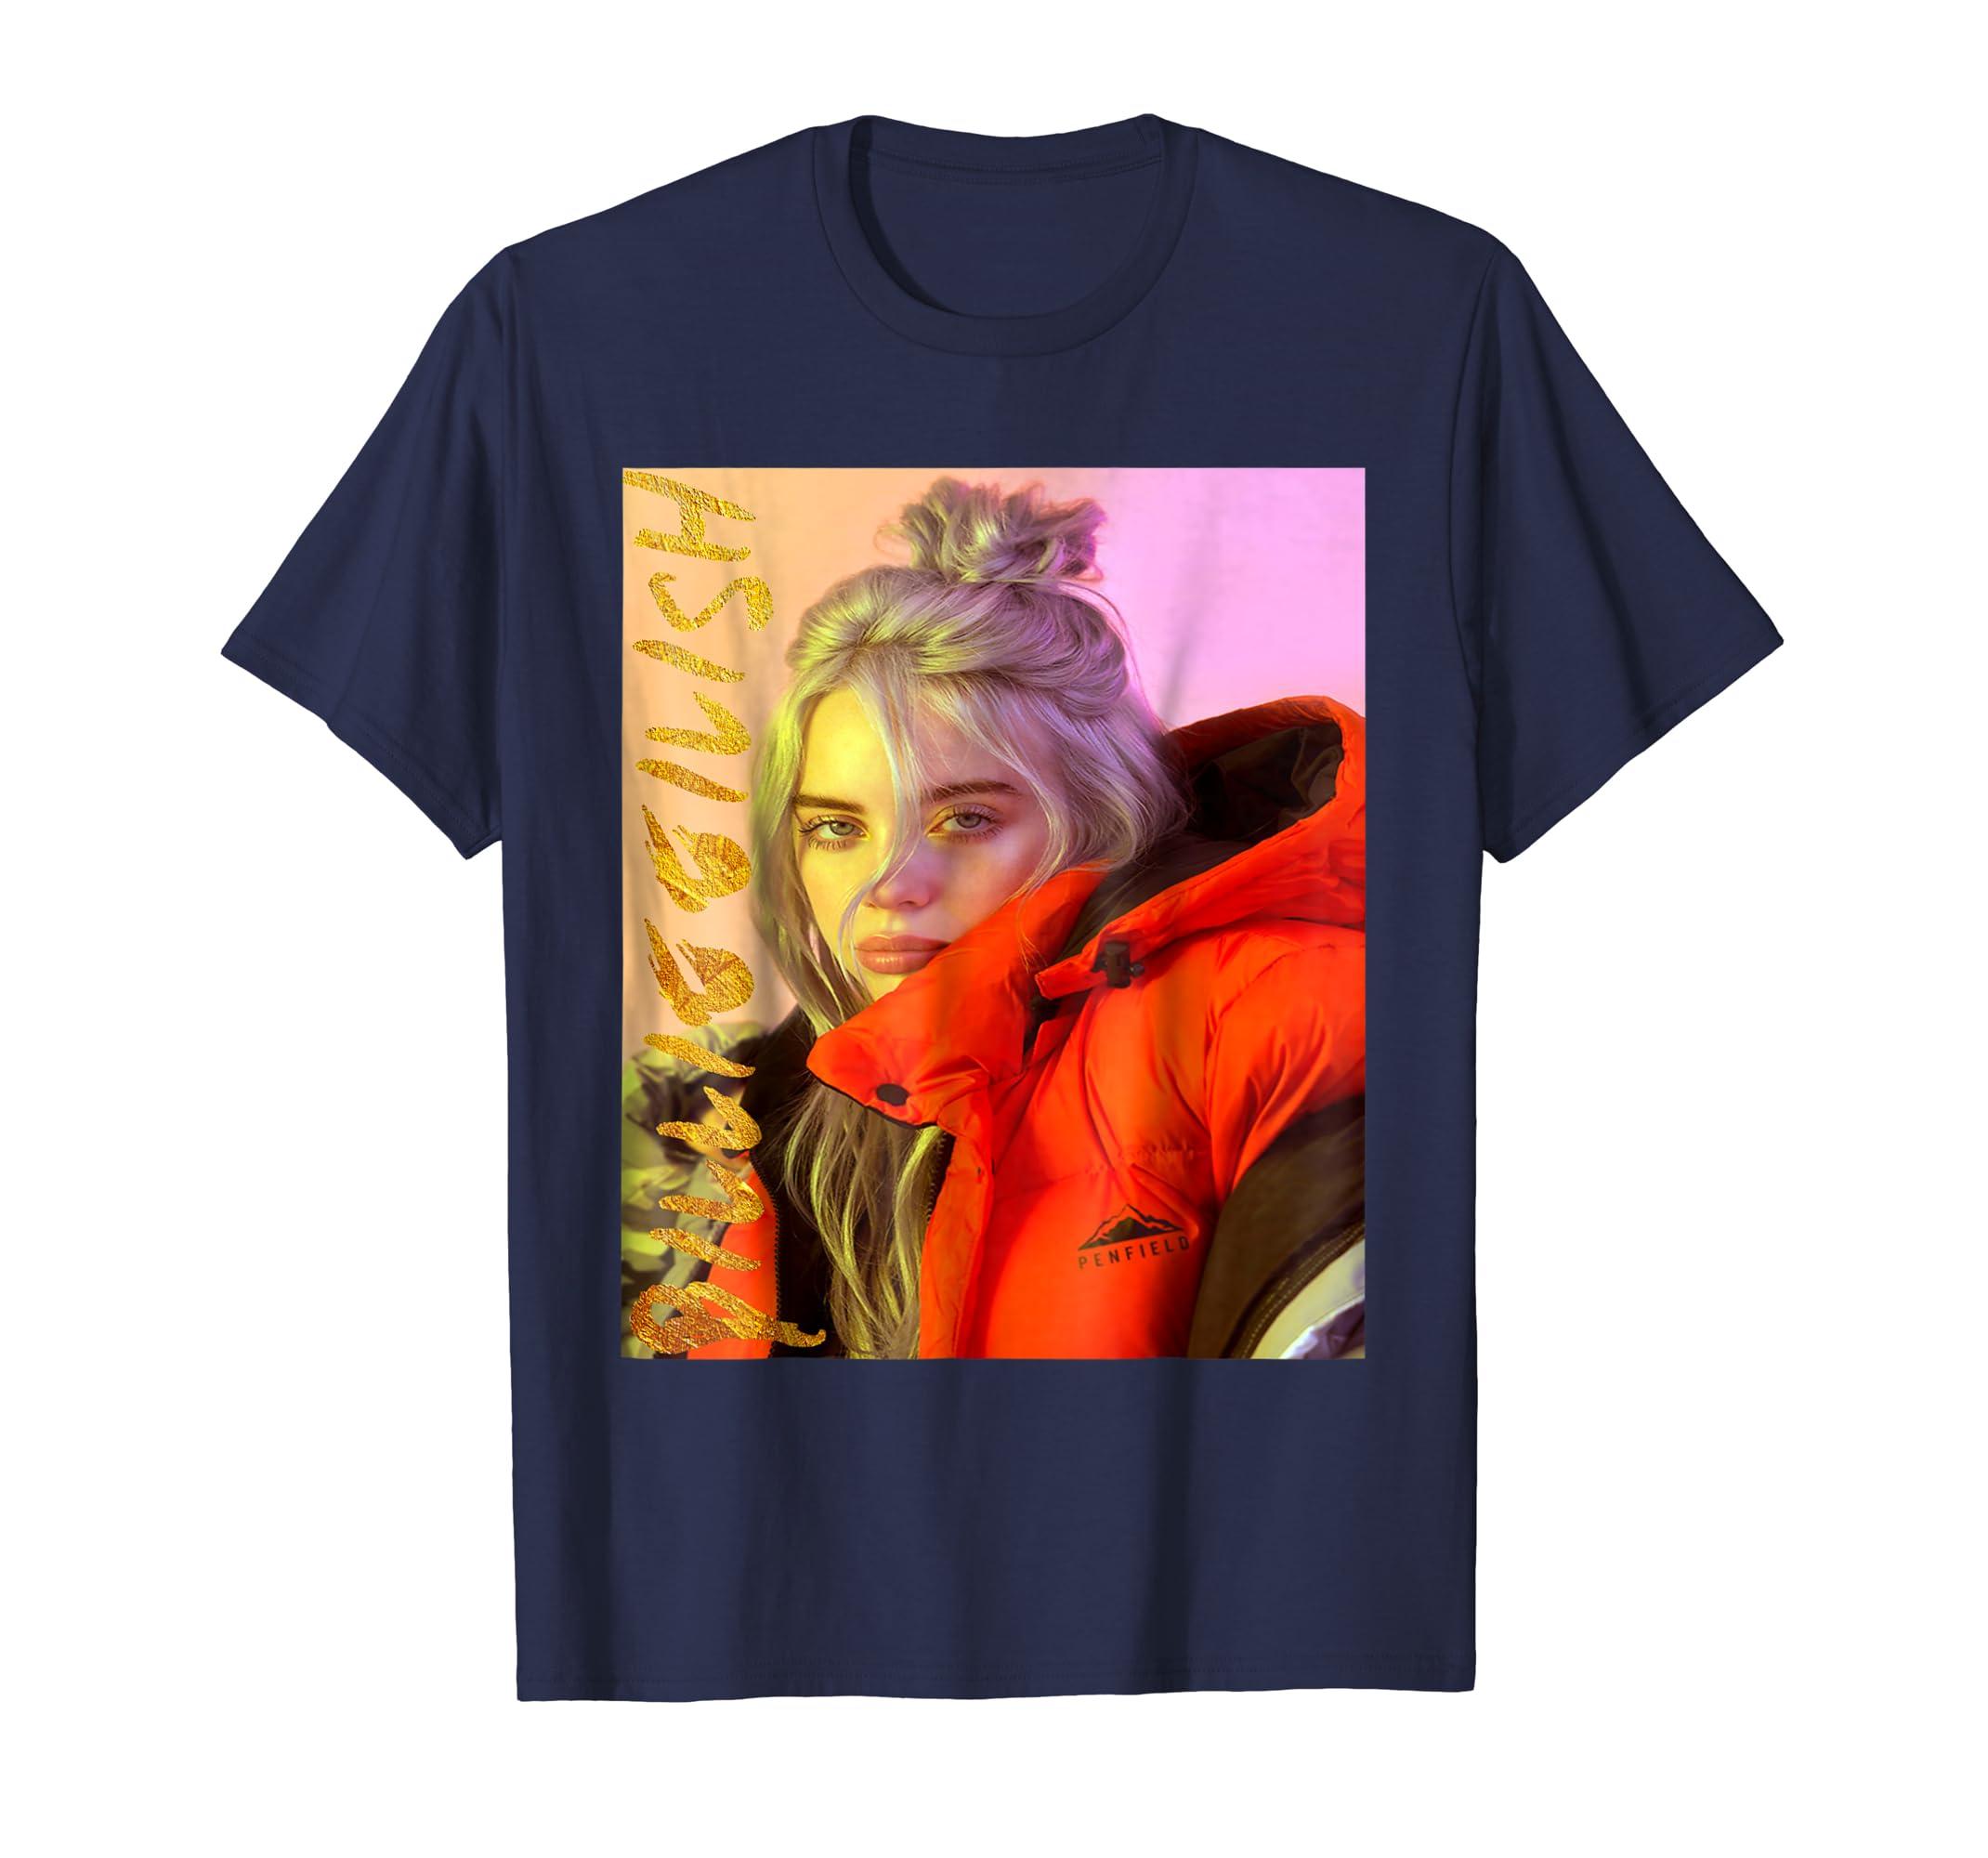 _Billie Eilish_.+tshirt-ln